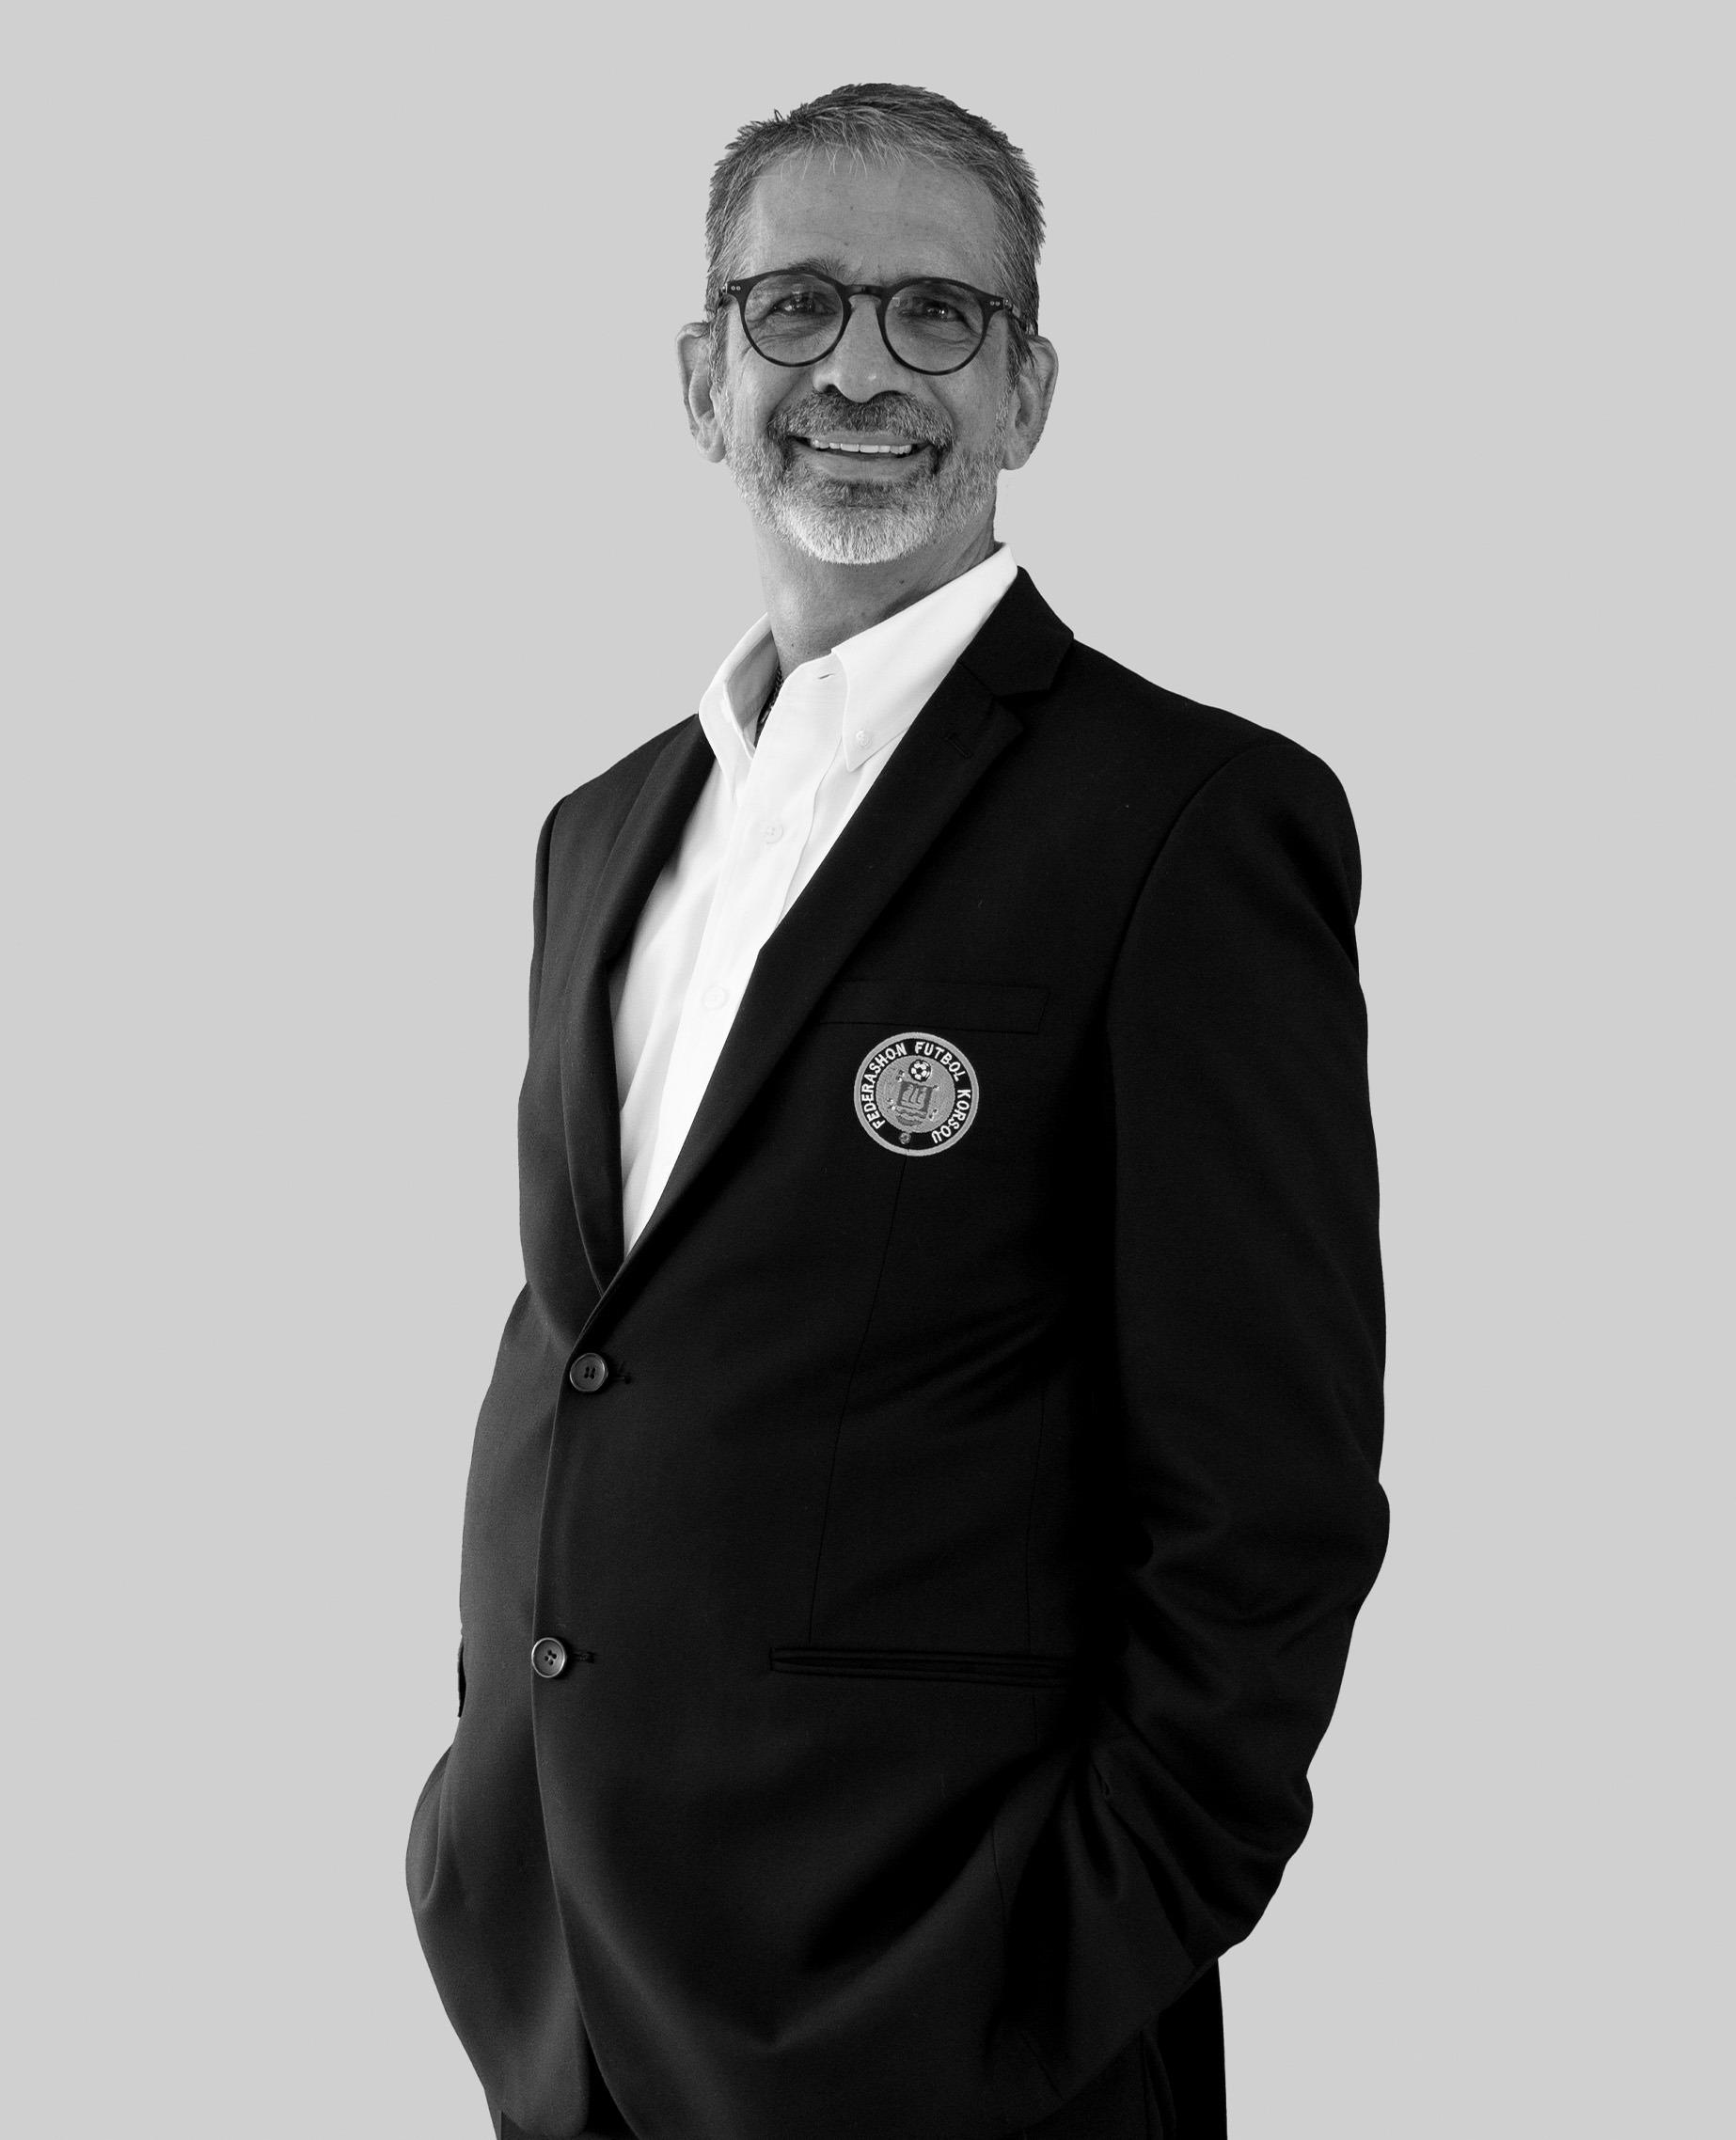 Shaheen Elhage, the president of Curacao Football Federation.